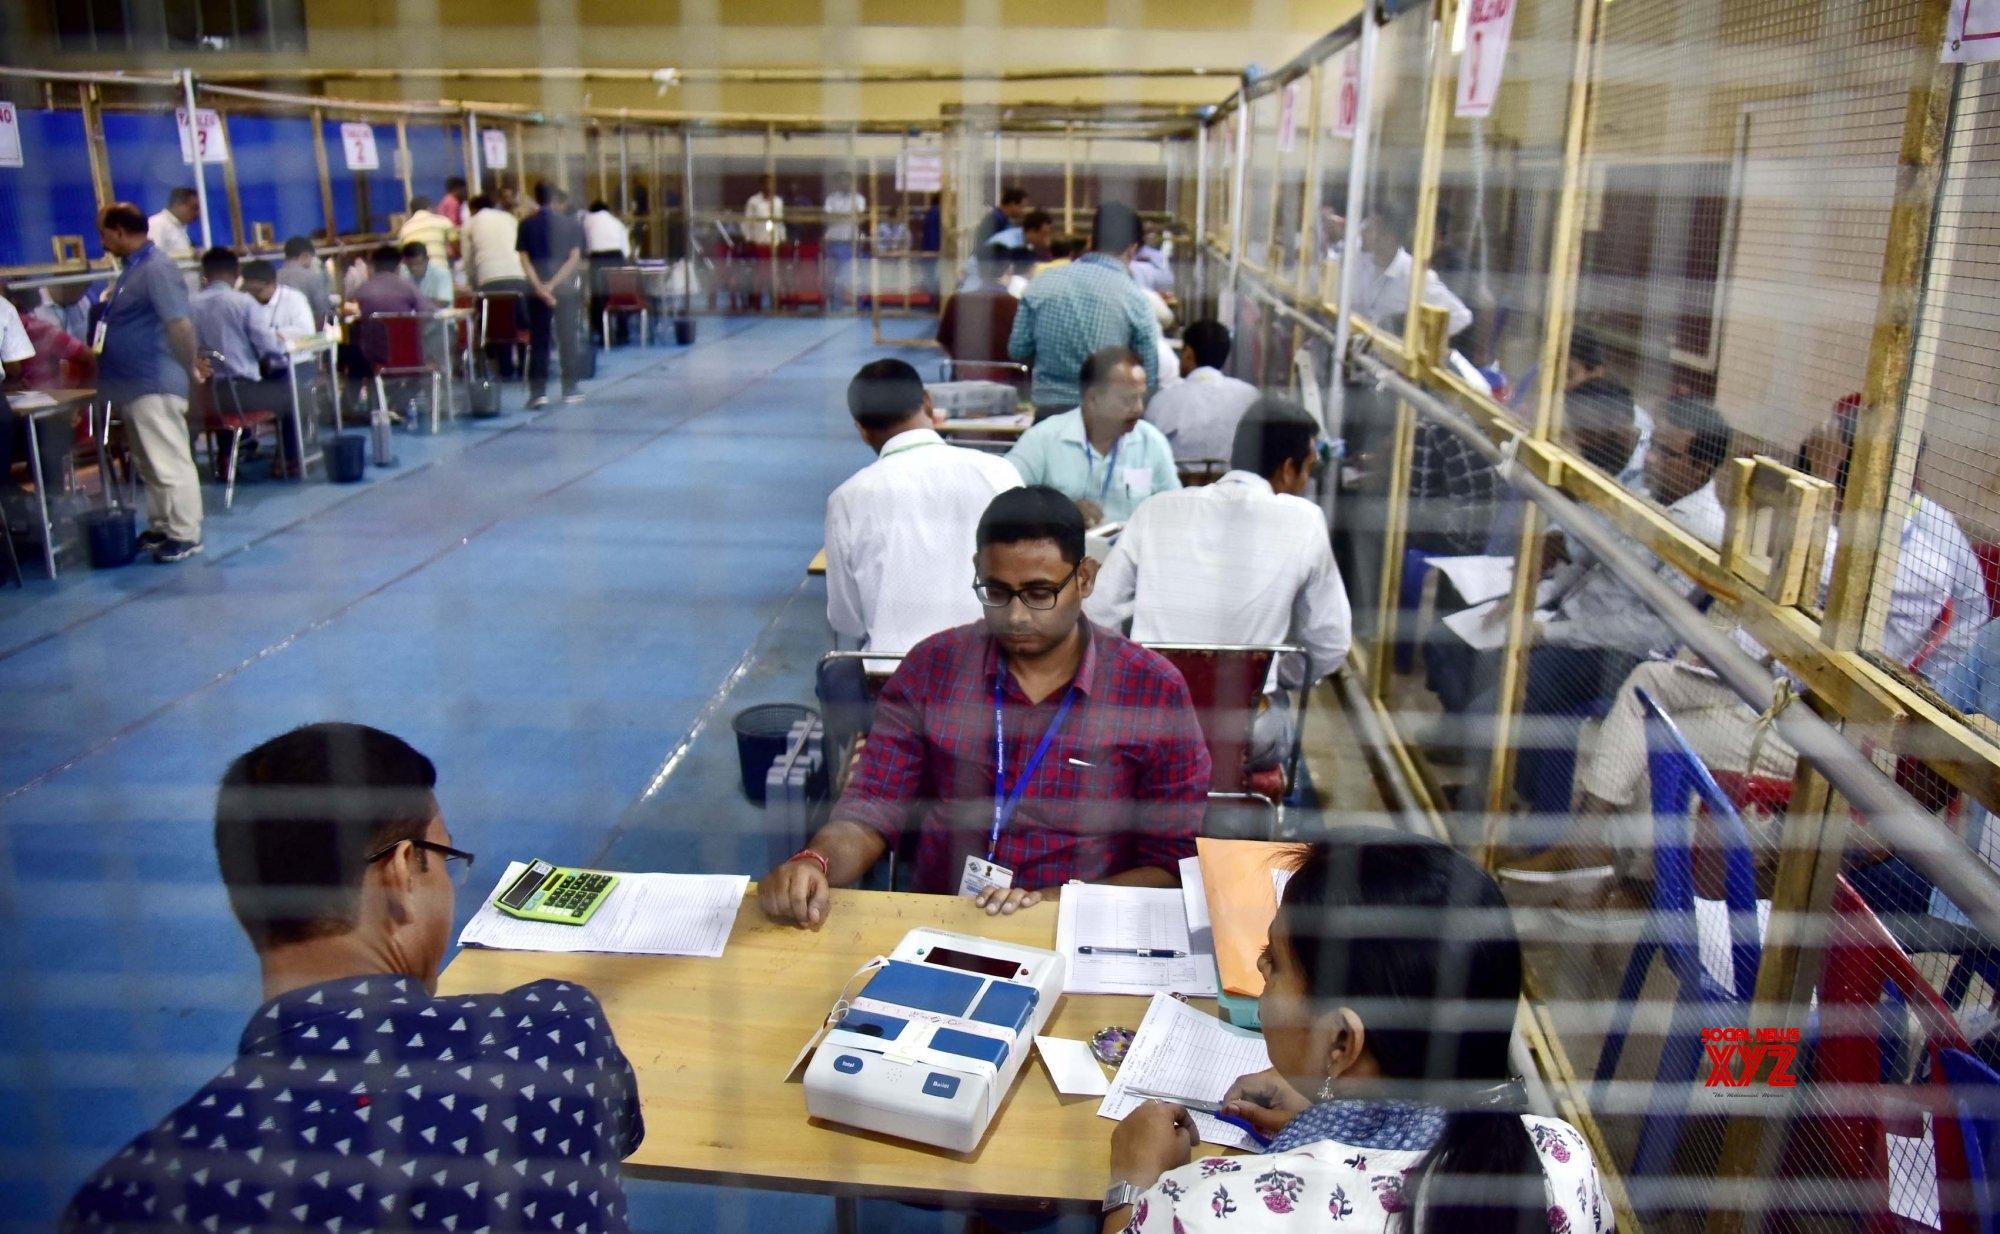 Guwahati: 2019 LS polls: Counting of votes underway #Gallery